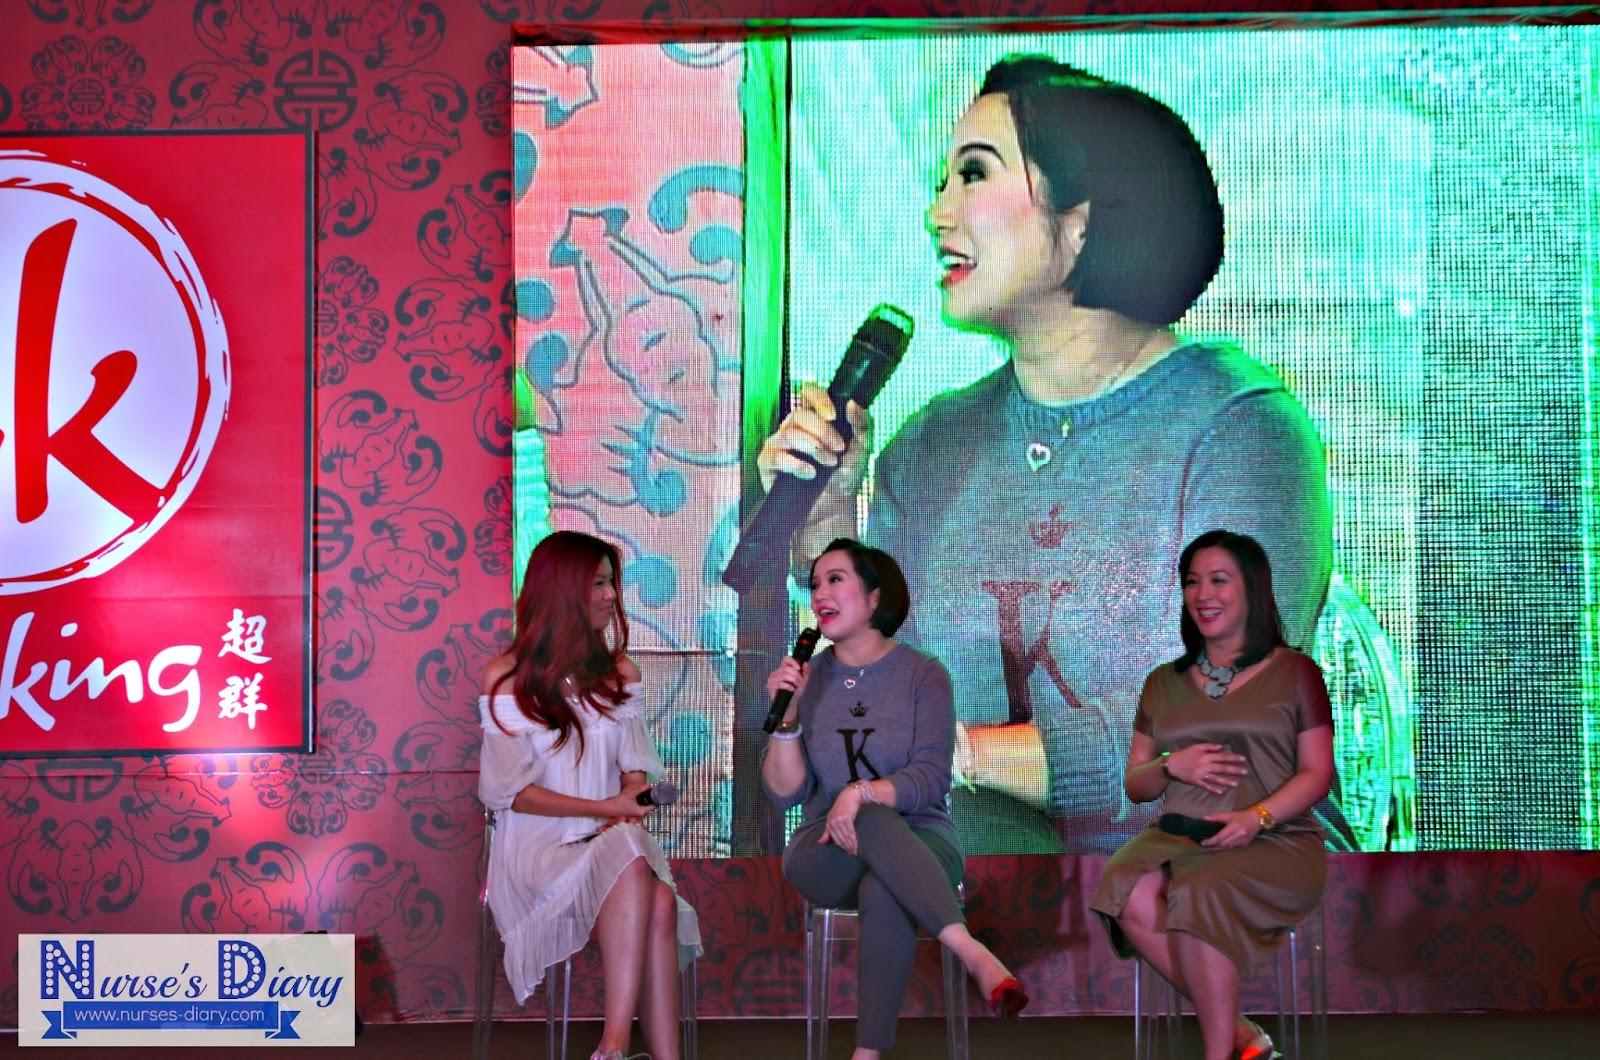 Kris Aquino; Chowking's Newest Franchisee